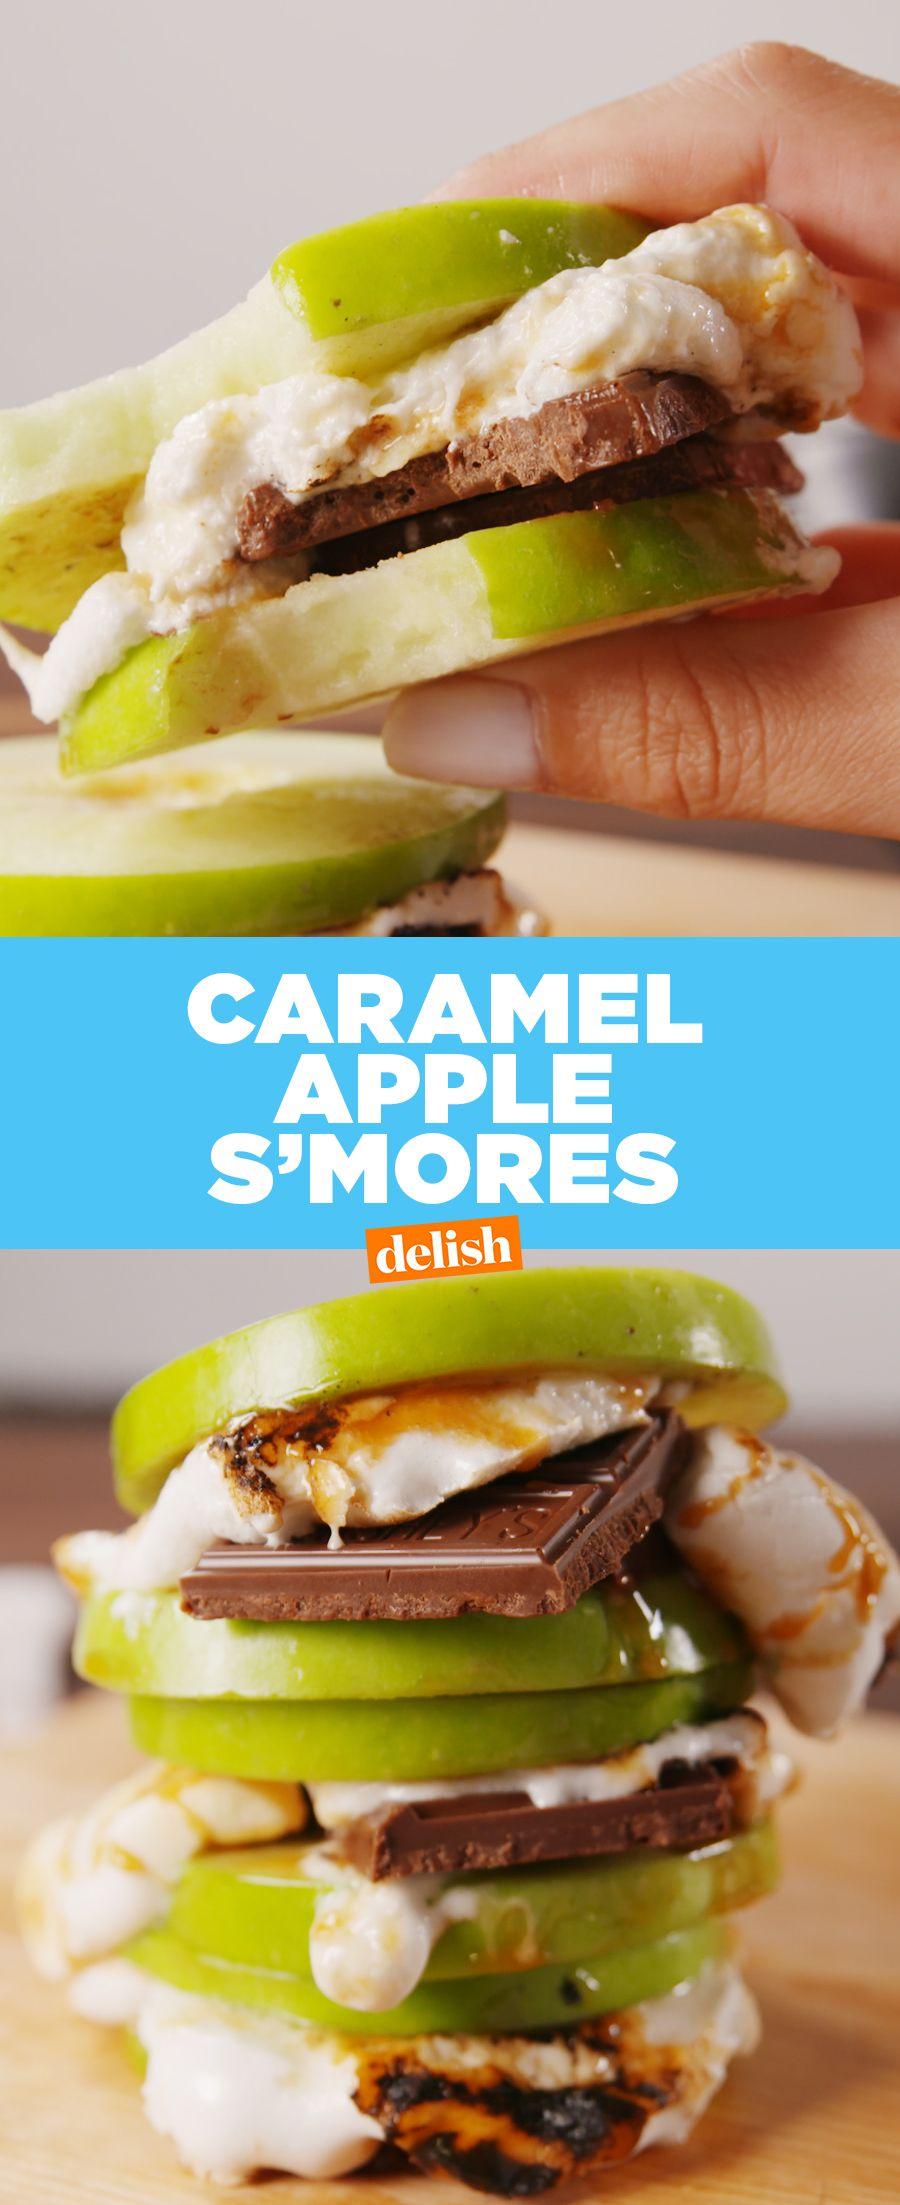 Caramel Apple S'mores Recipe Healthy vegan snacks